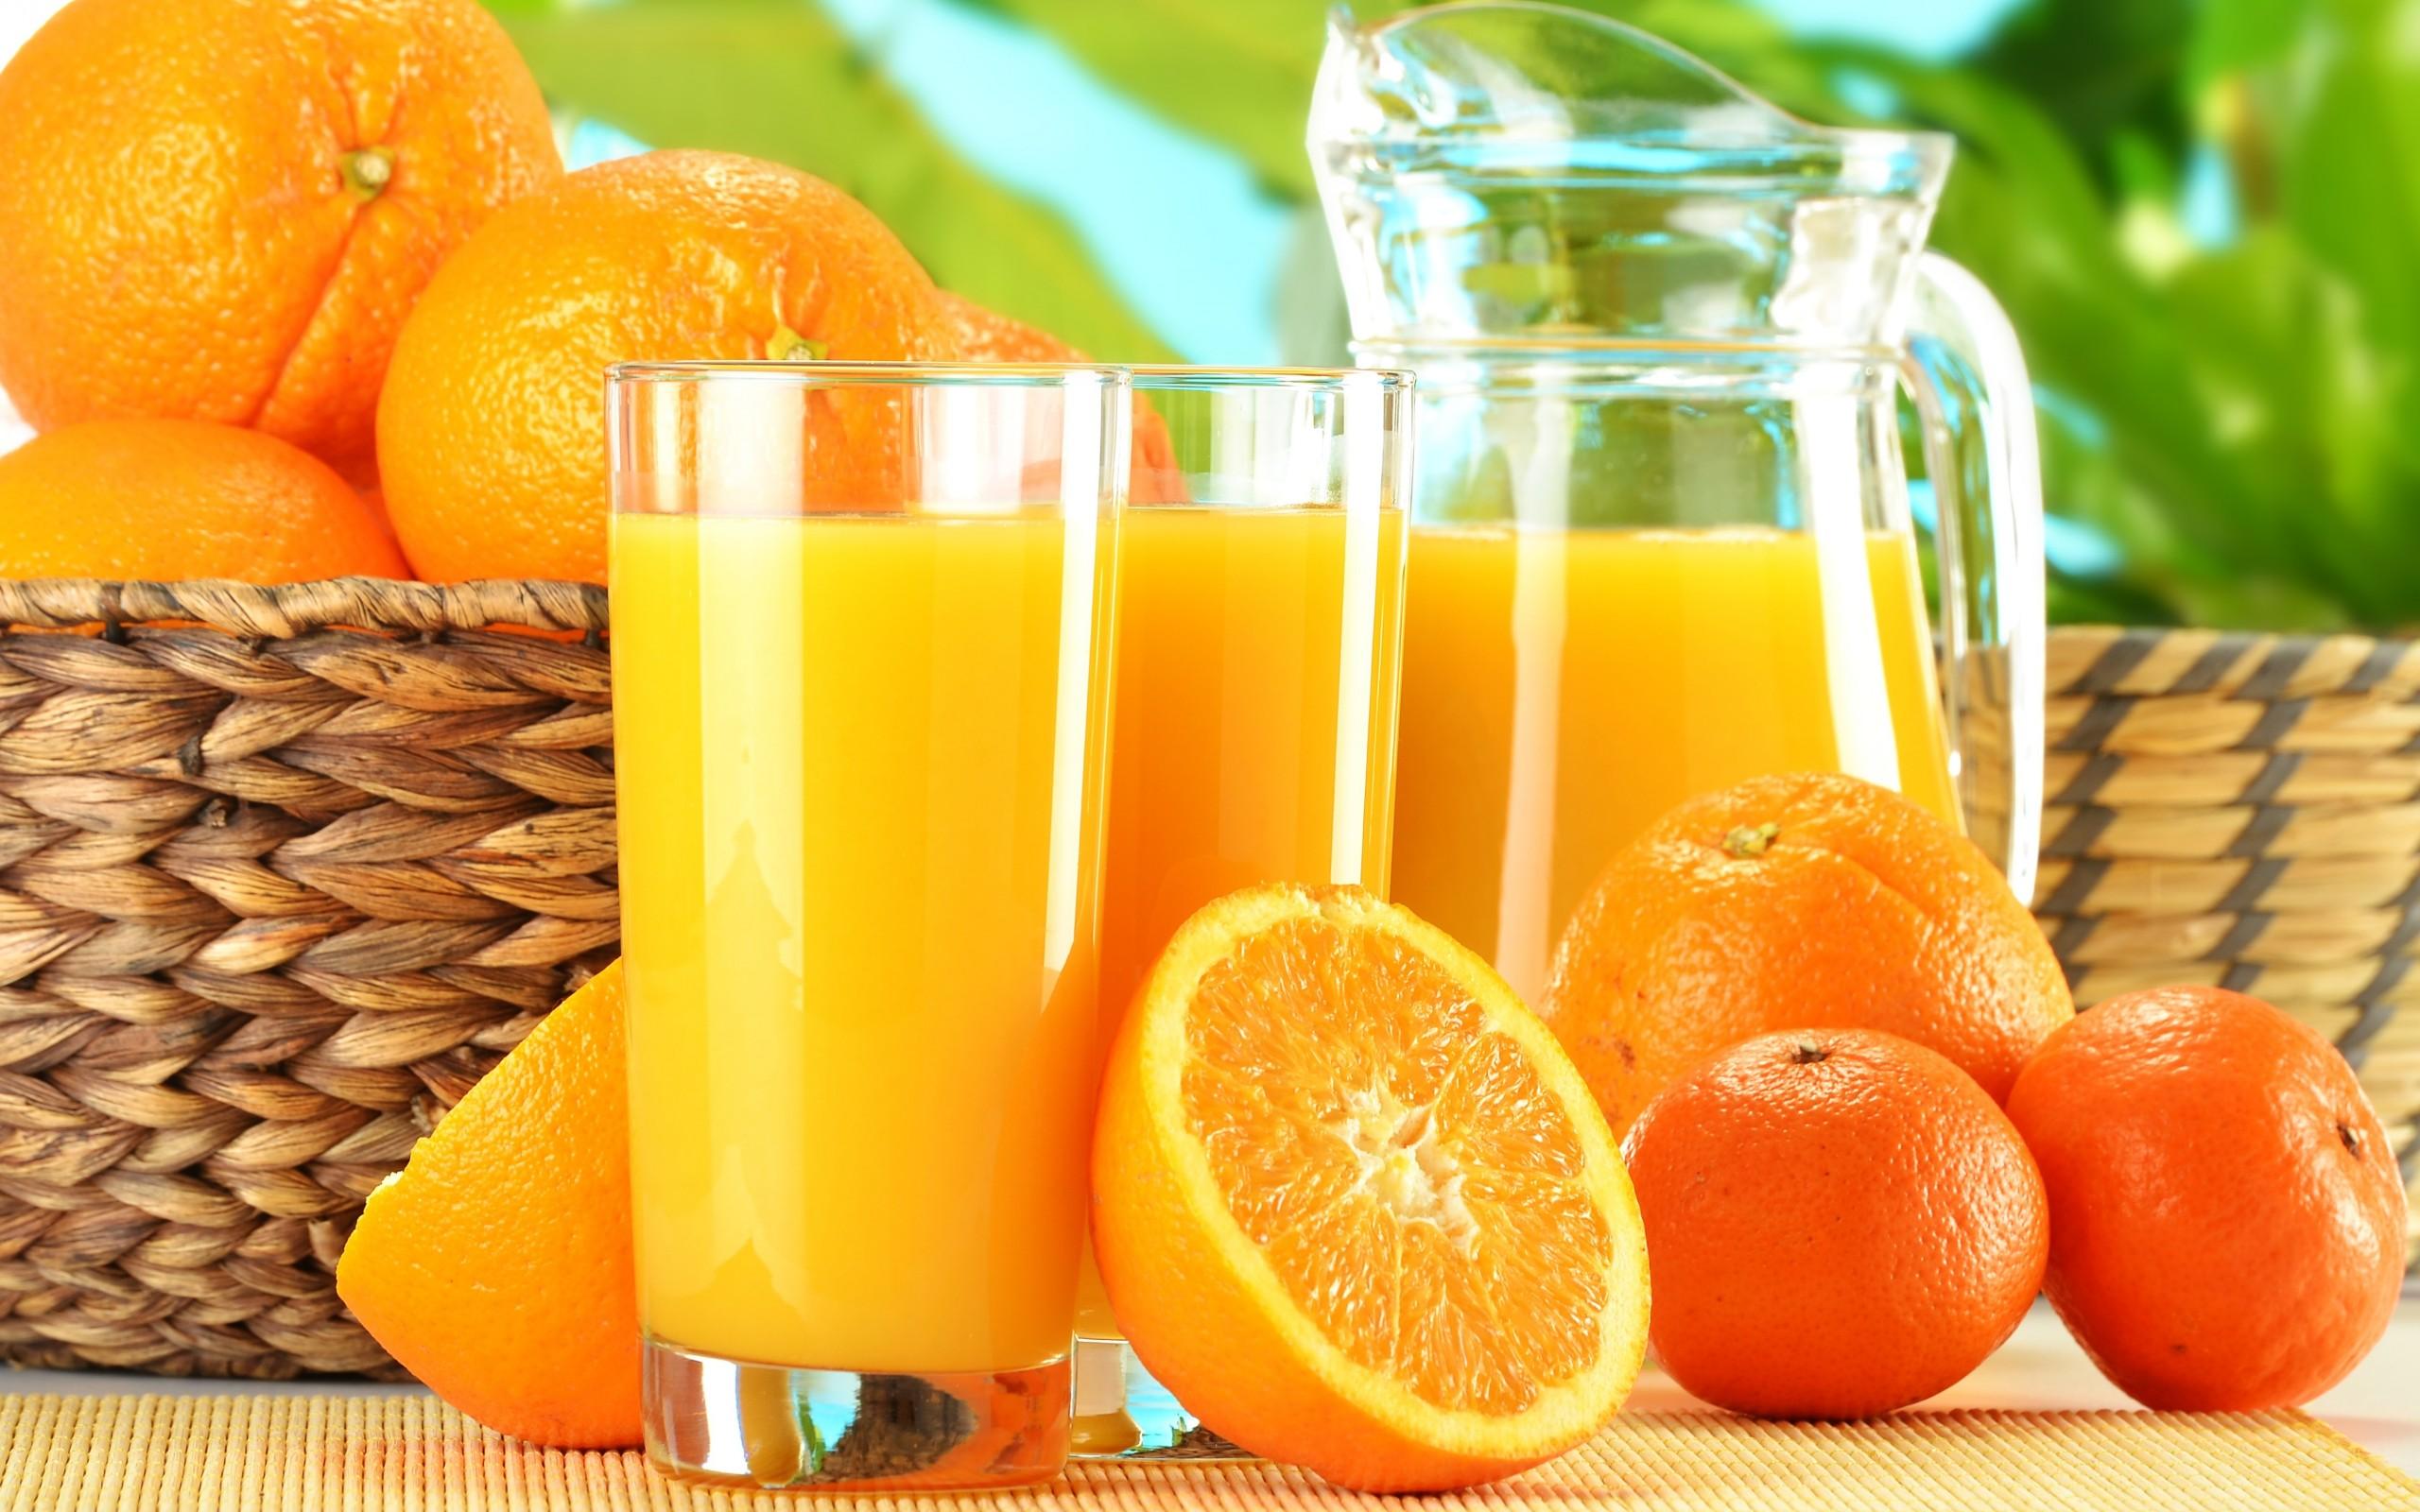 sanibel-ice-cream-zebra-treats-glass-orange-juice